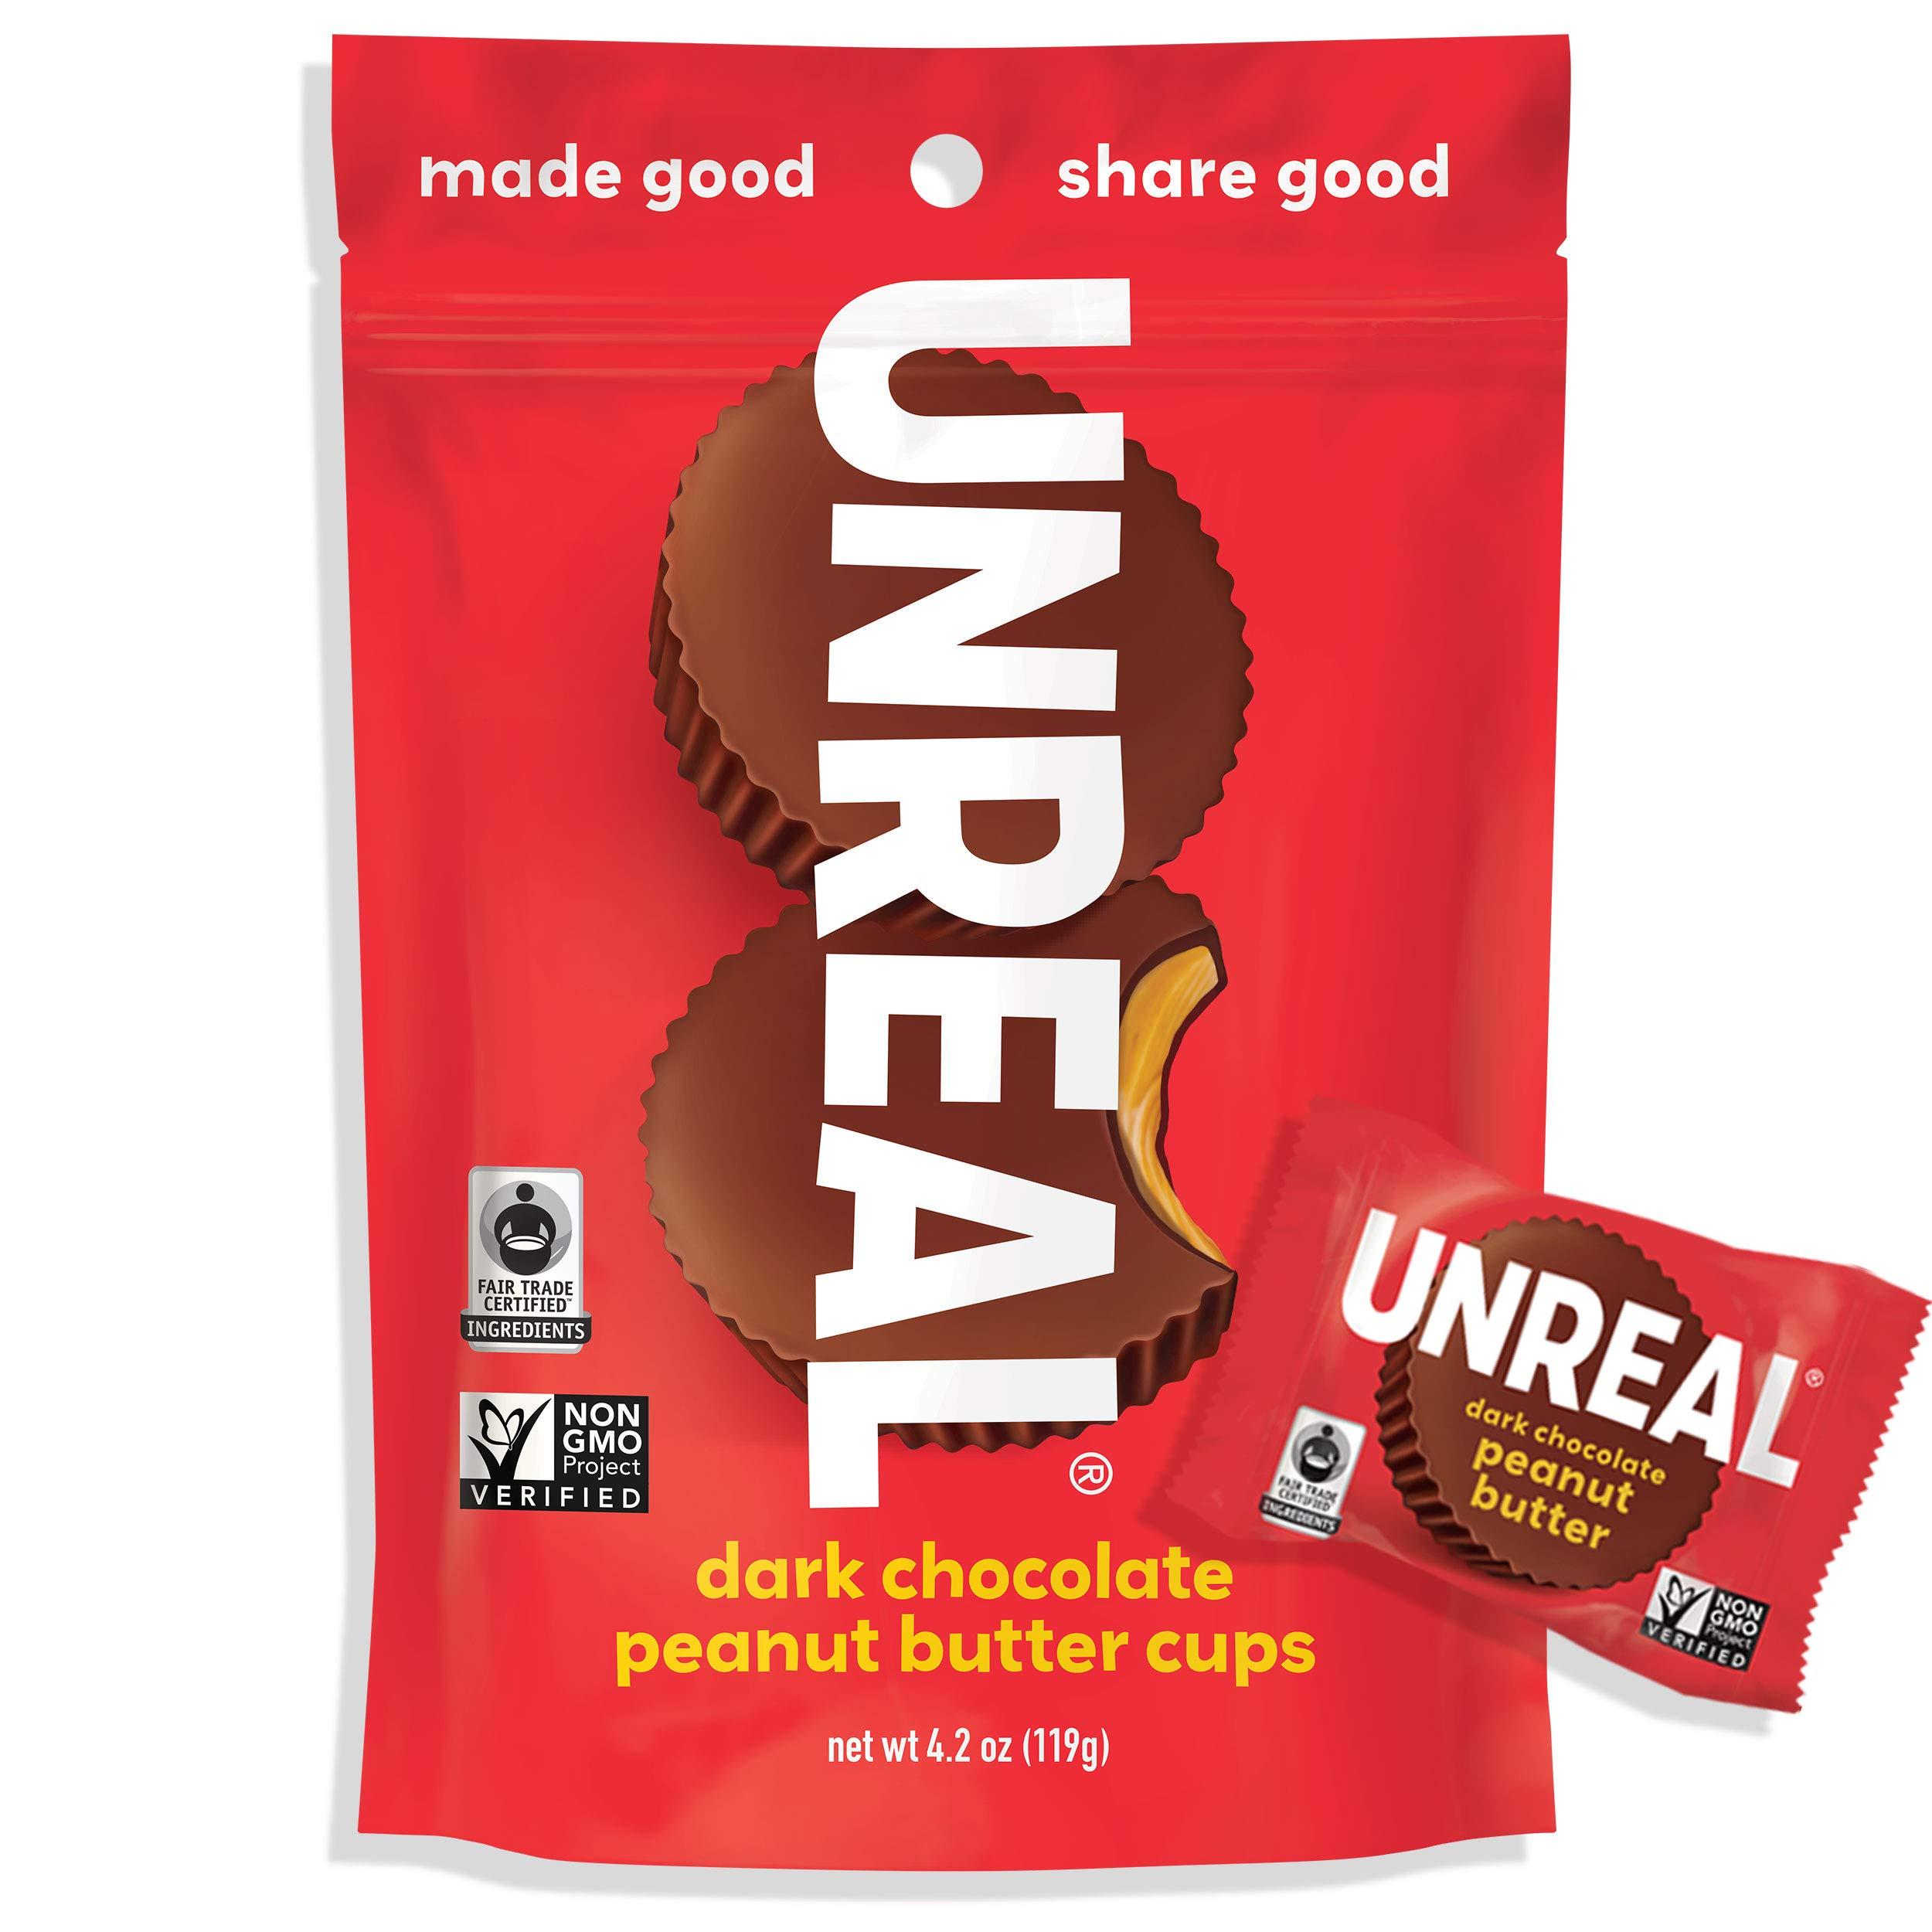 CDM product UNREAL Dark Chocolate Peanut Butter Cups   Less Sugar, Vegan, Gluten Free   6 Bags big image